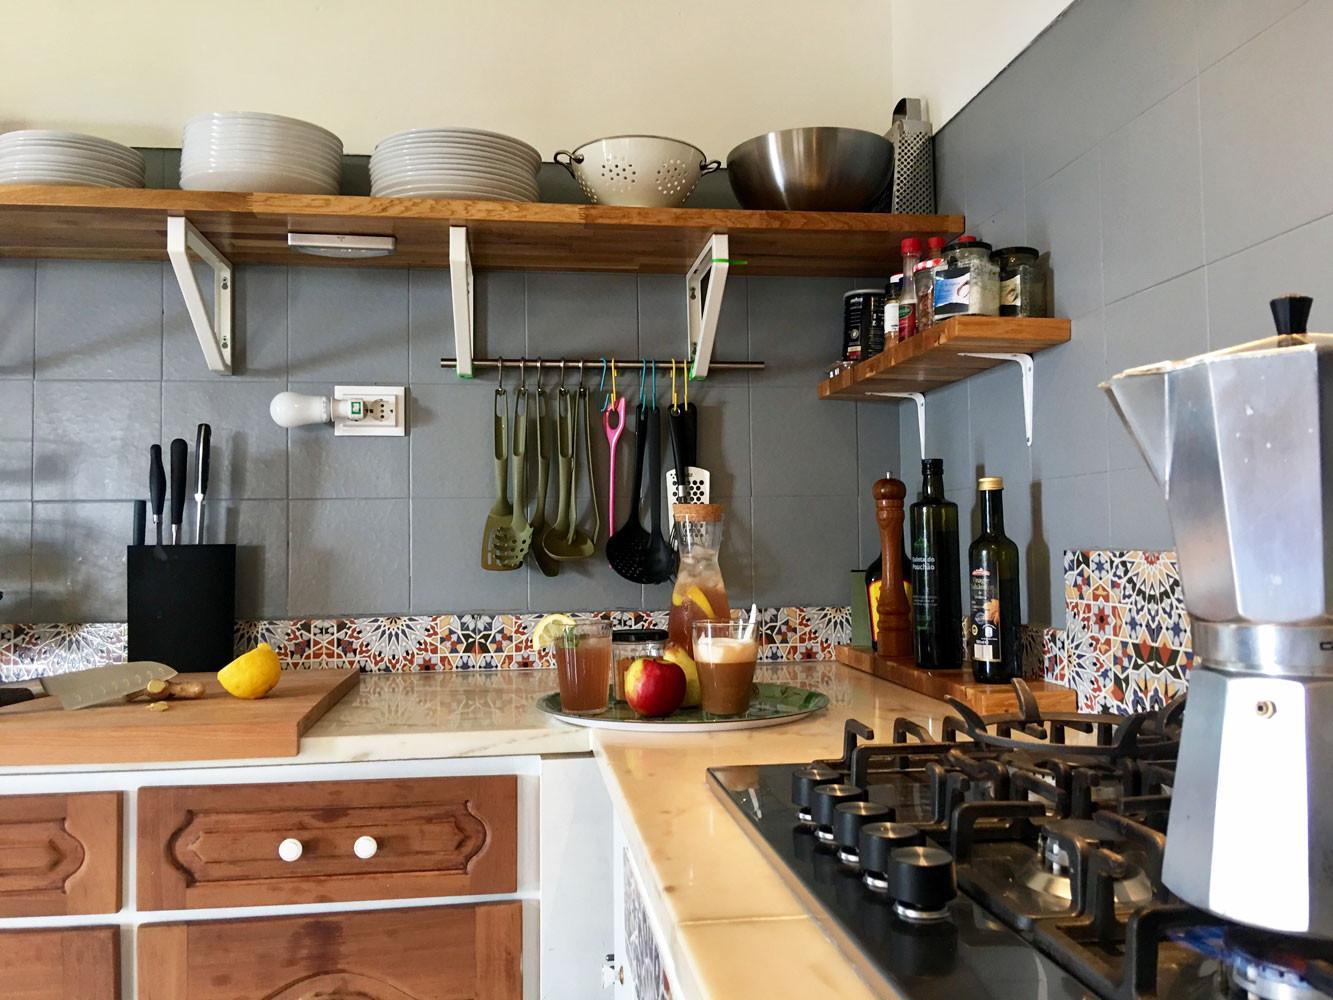 #shared kitchen